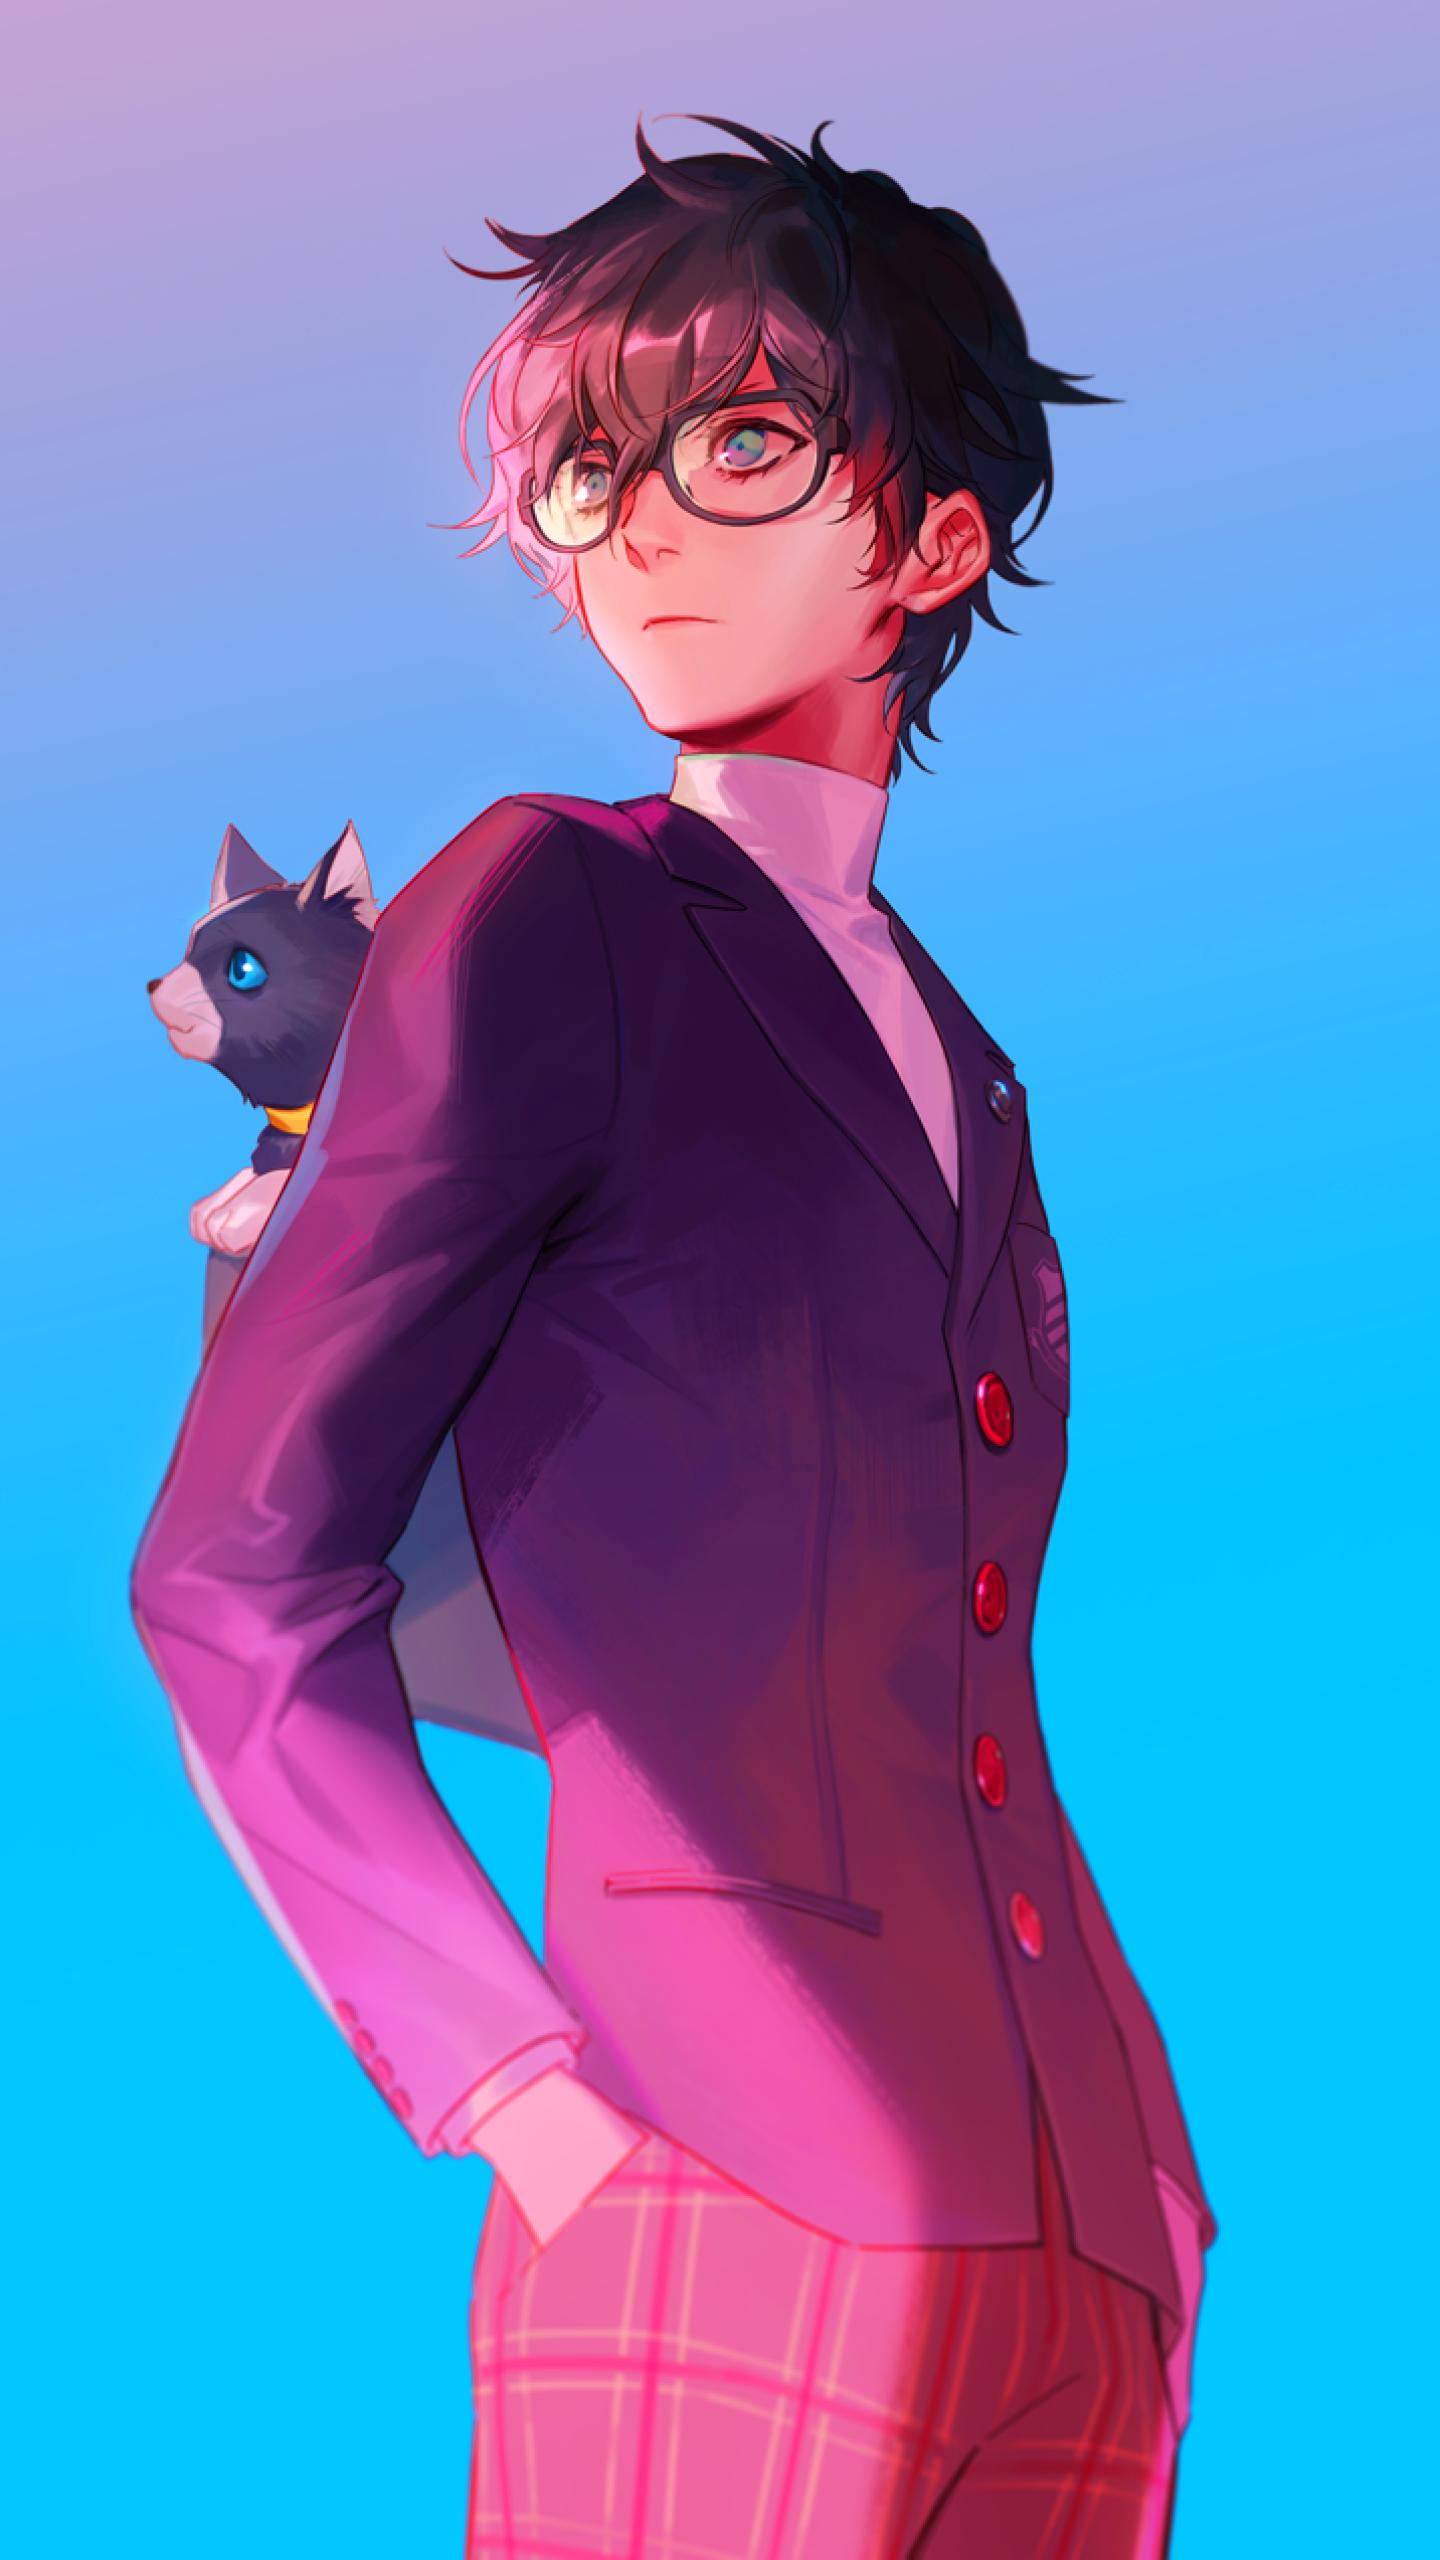 Persona 5 In 2020